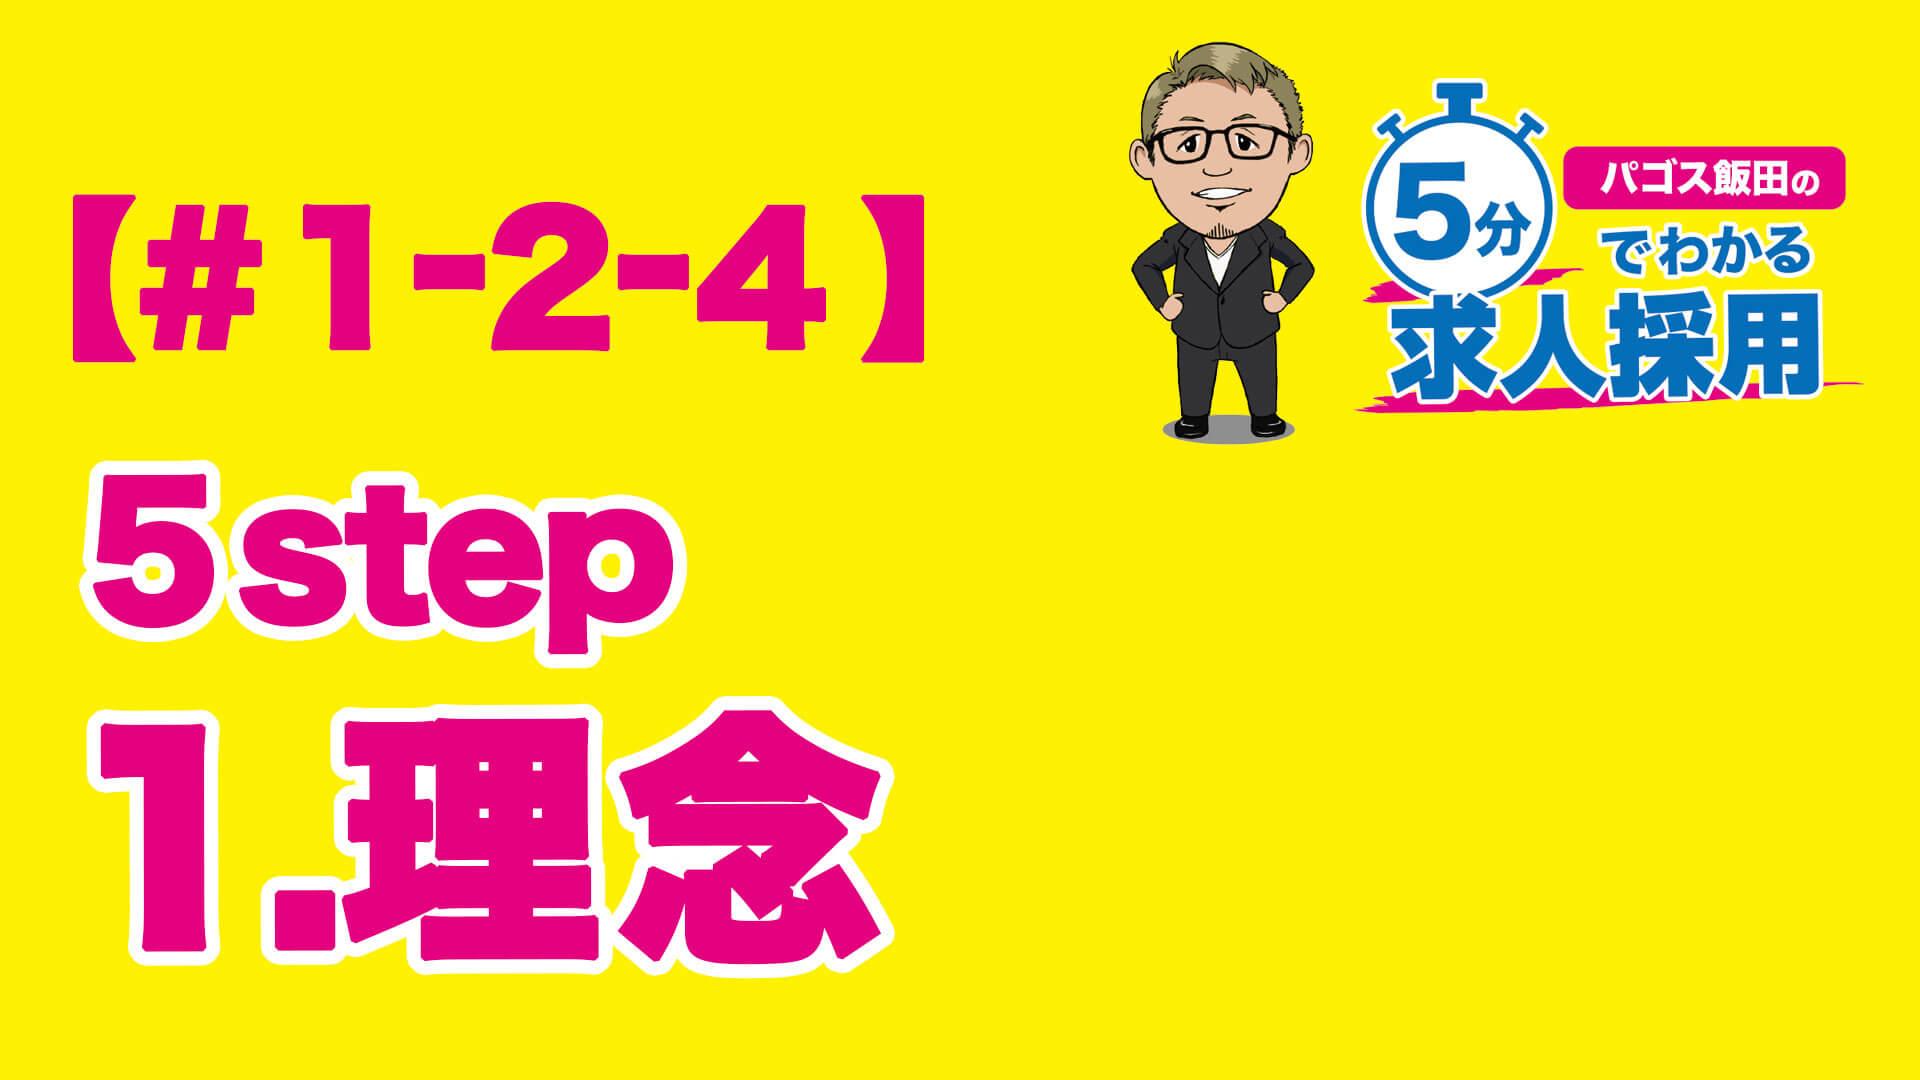 【#1-2-4】5step 1.理念